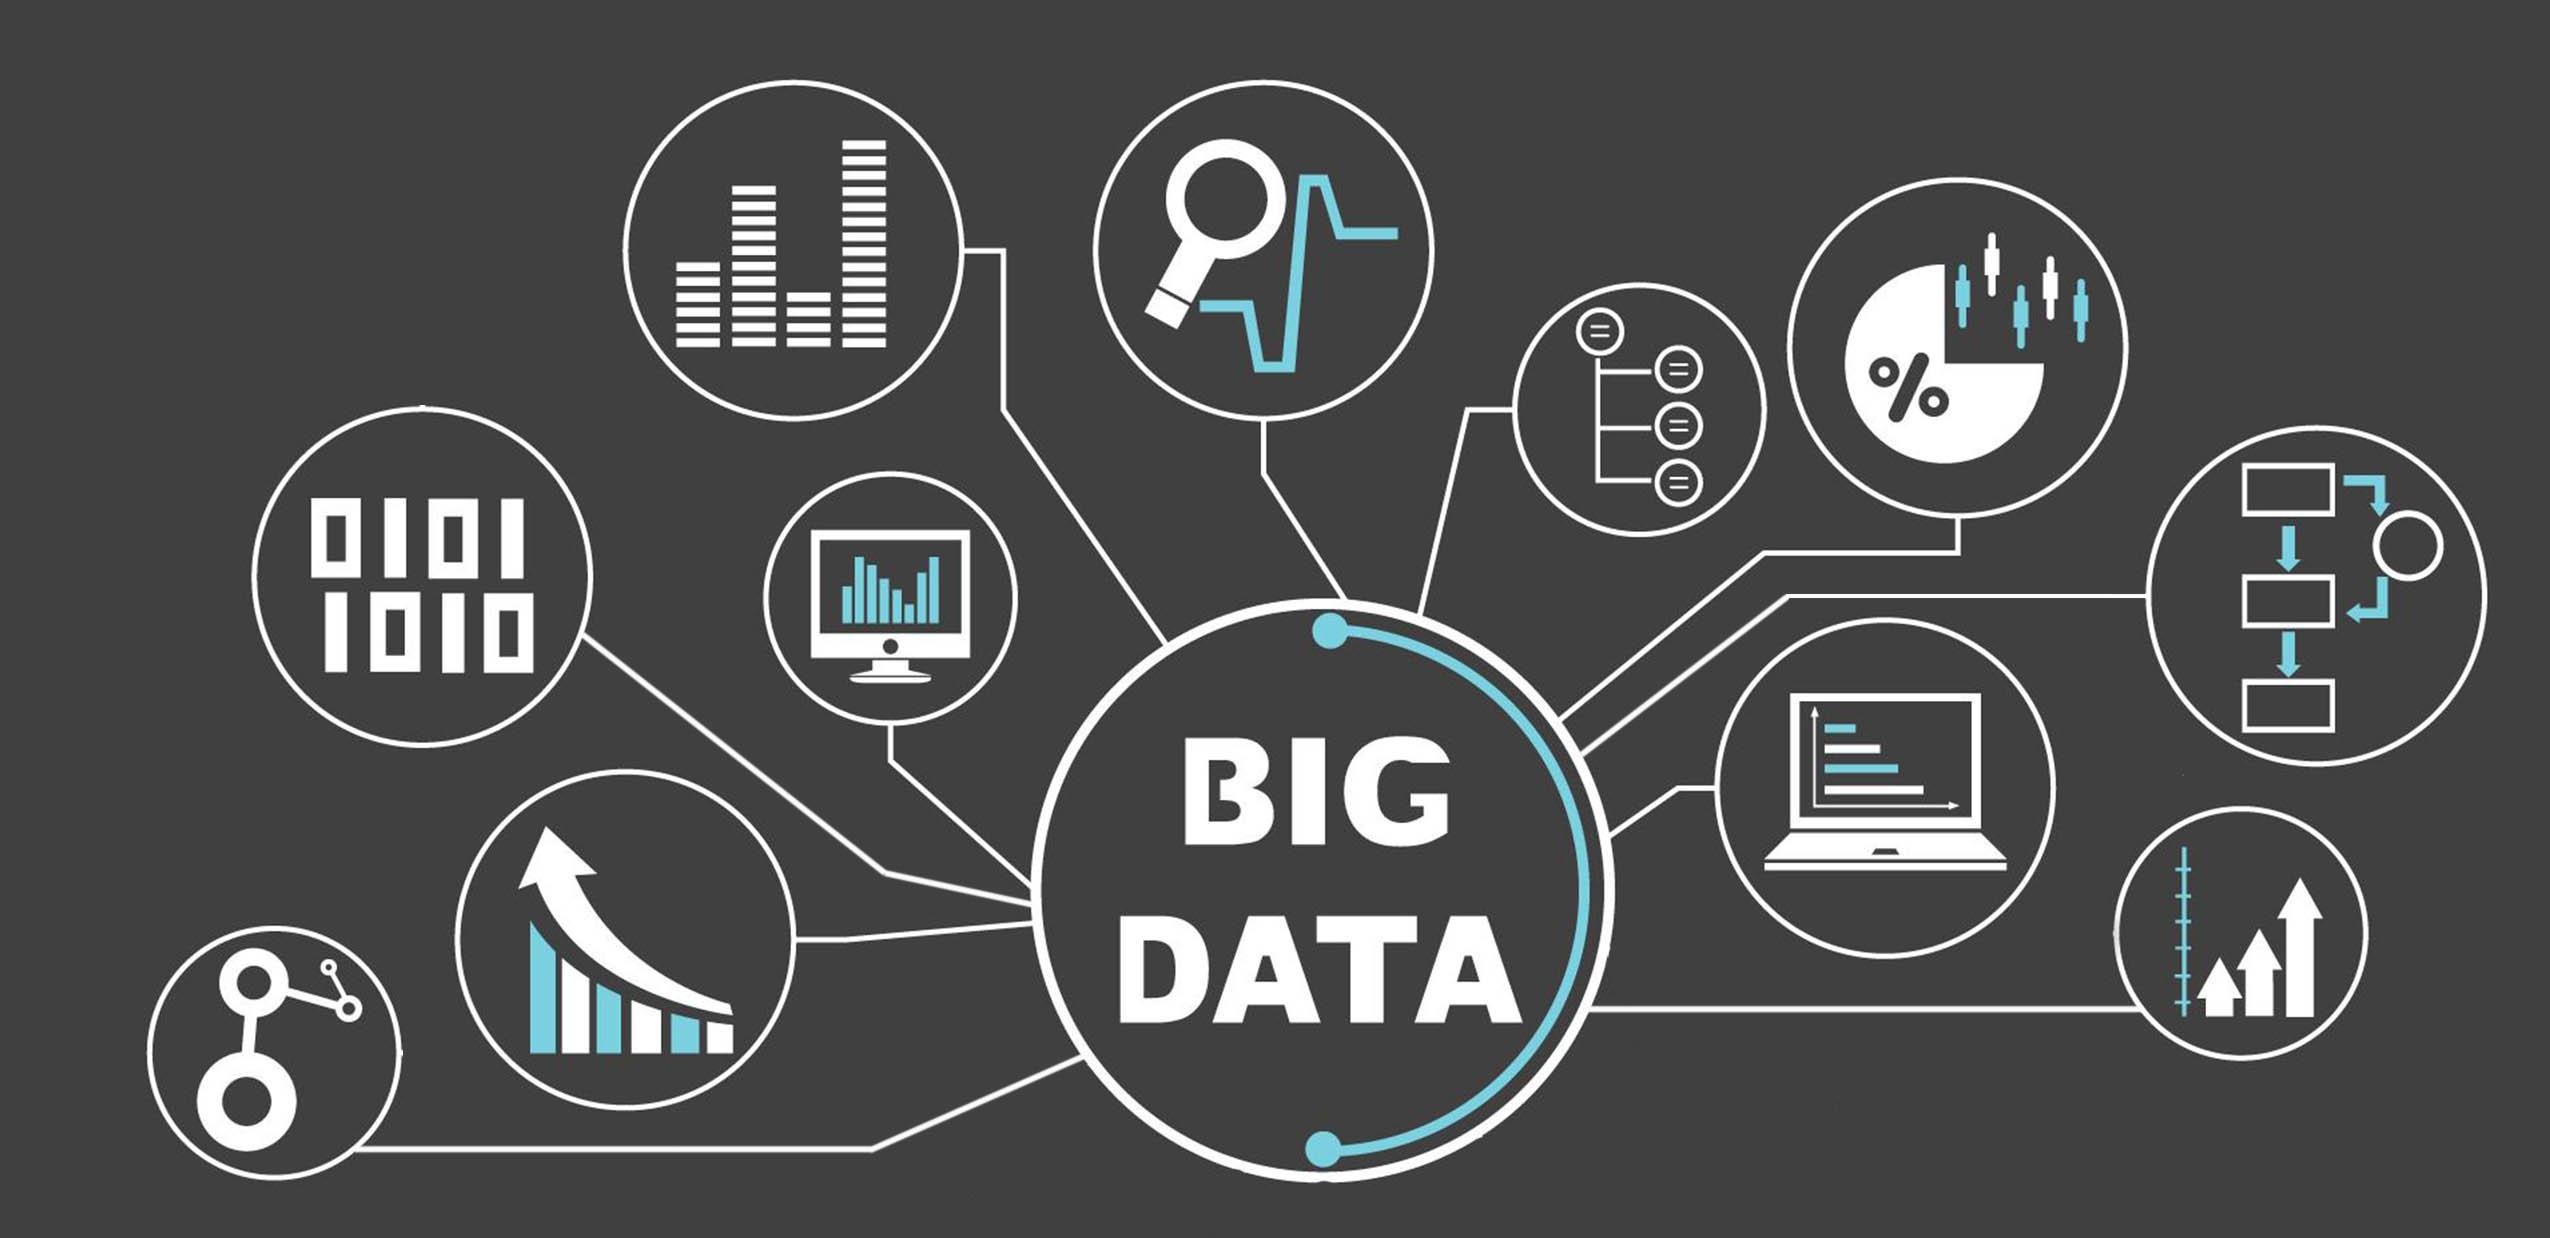 Big-Data-Blog-Image